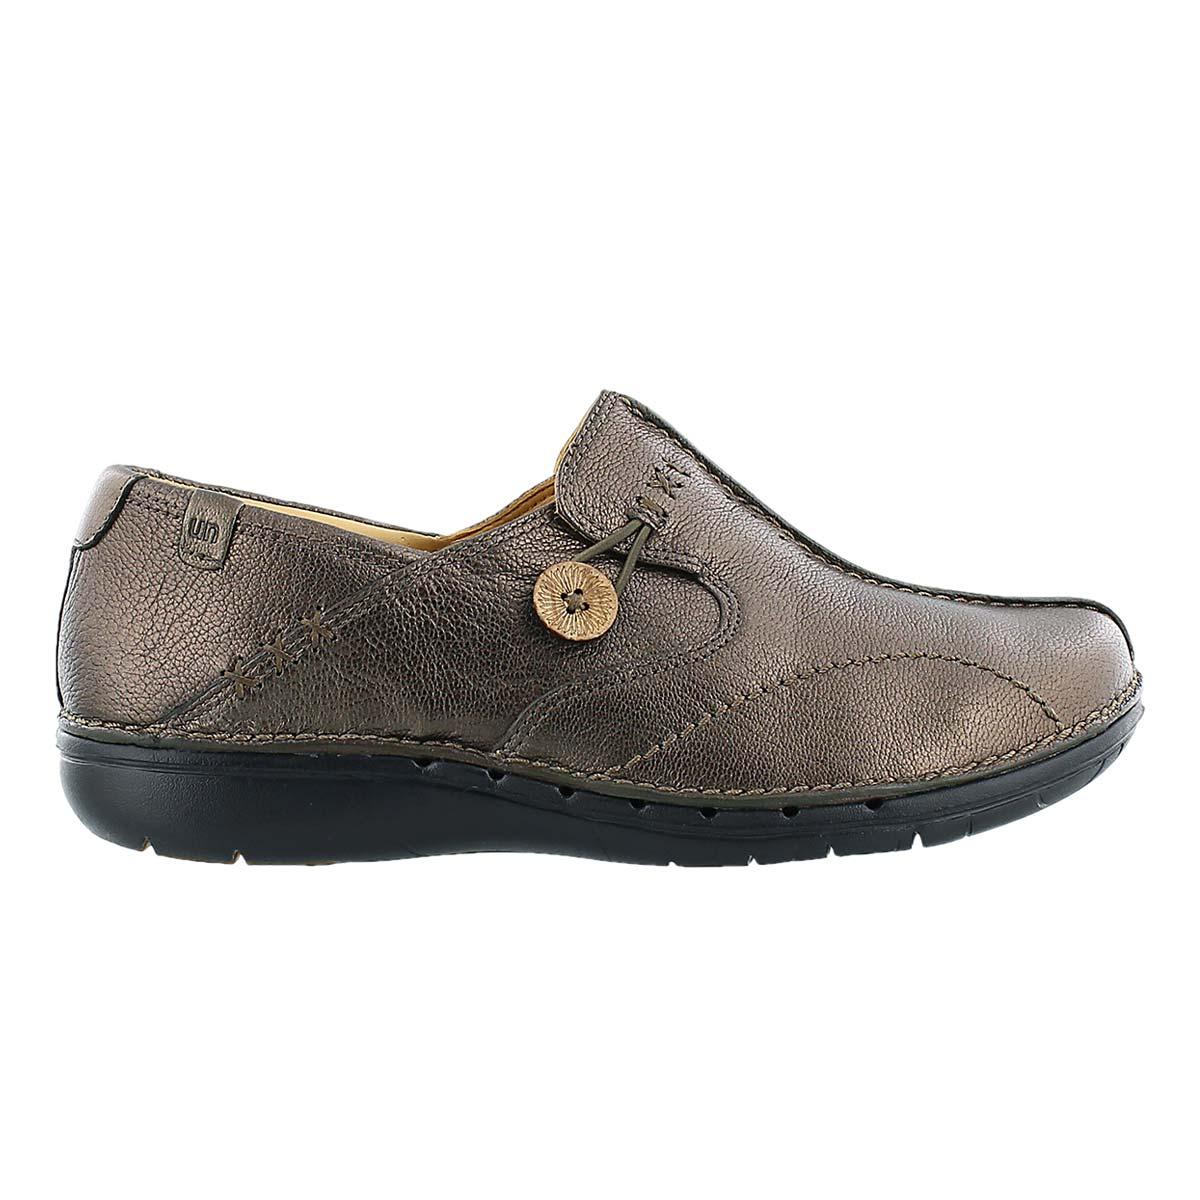 Lds Un.Loop brnz leather comfort slip on